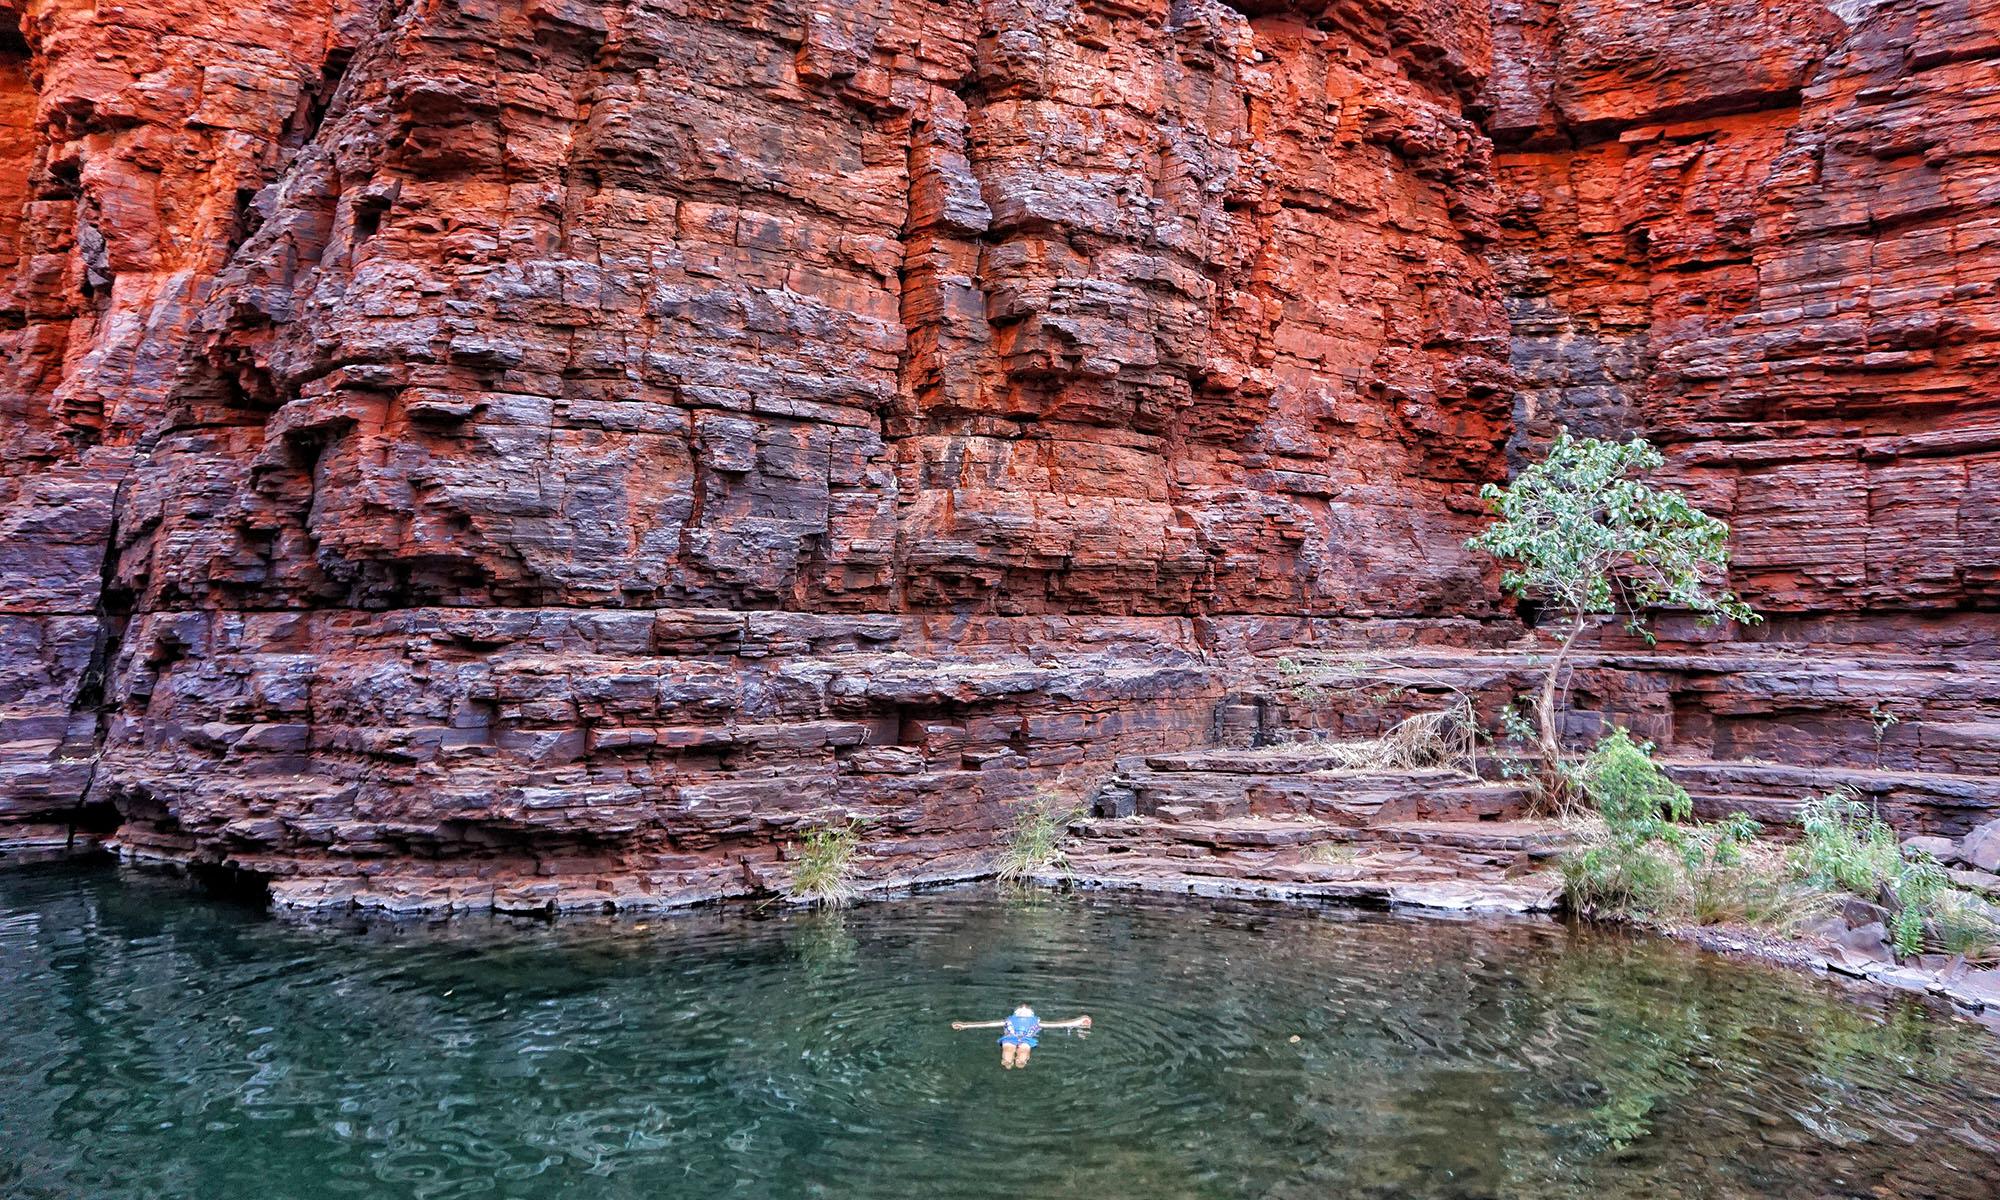 DSC05642-01-01-Knox-Gorge-Swimming